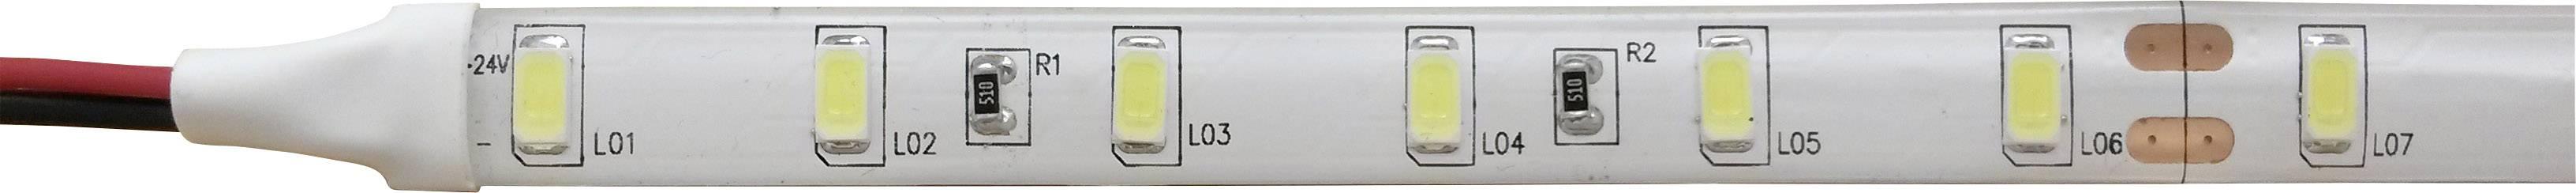 LED pásek Barthelme 51511434 51511434, 24 V, 16 wpm, bílá, 500 cm